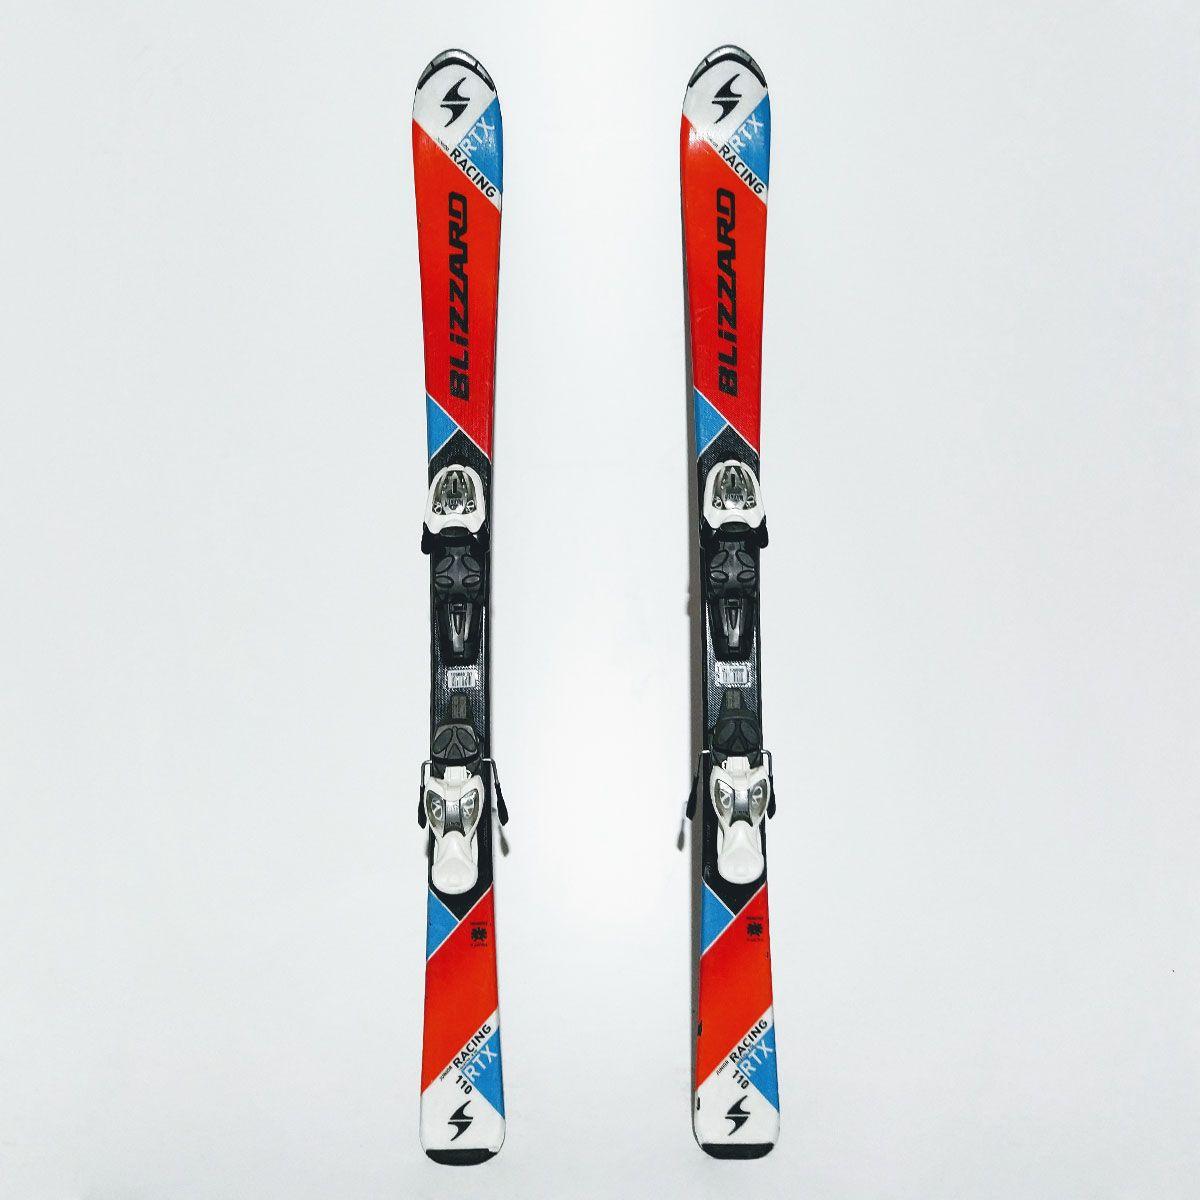 schiuri-blizzard-rtx-racing-jr-1